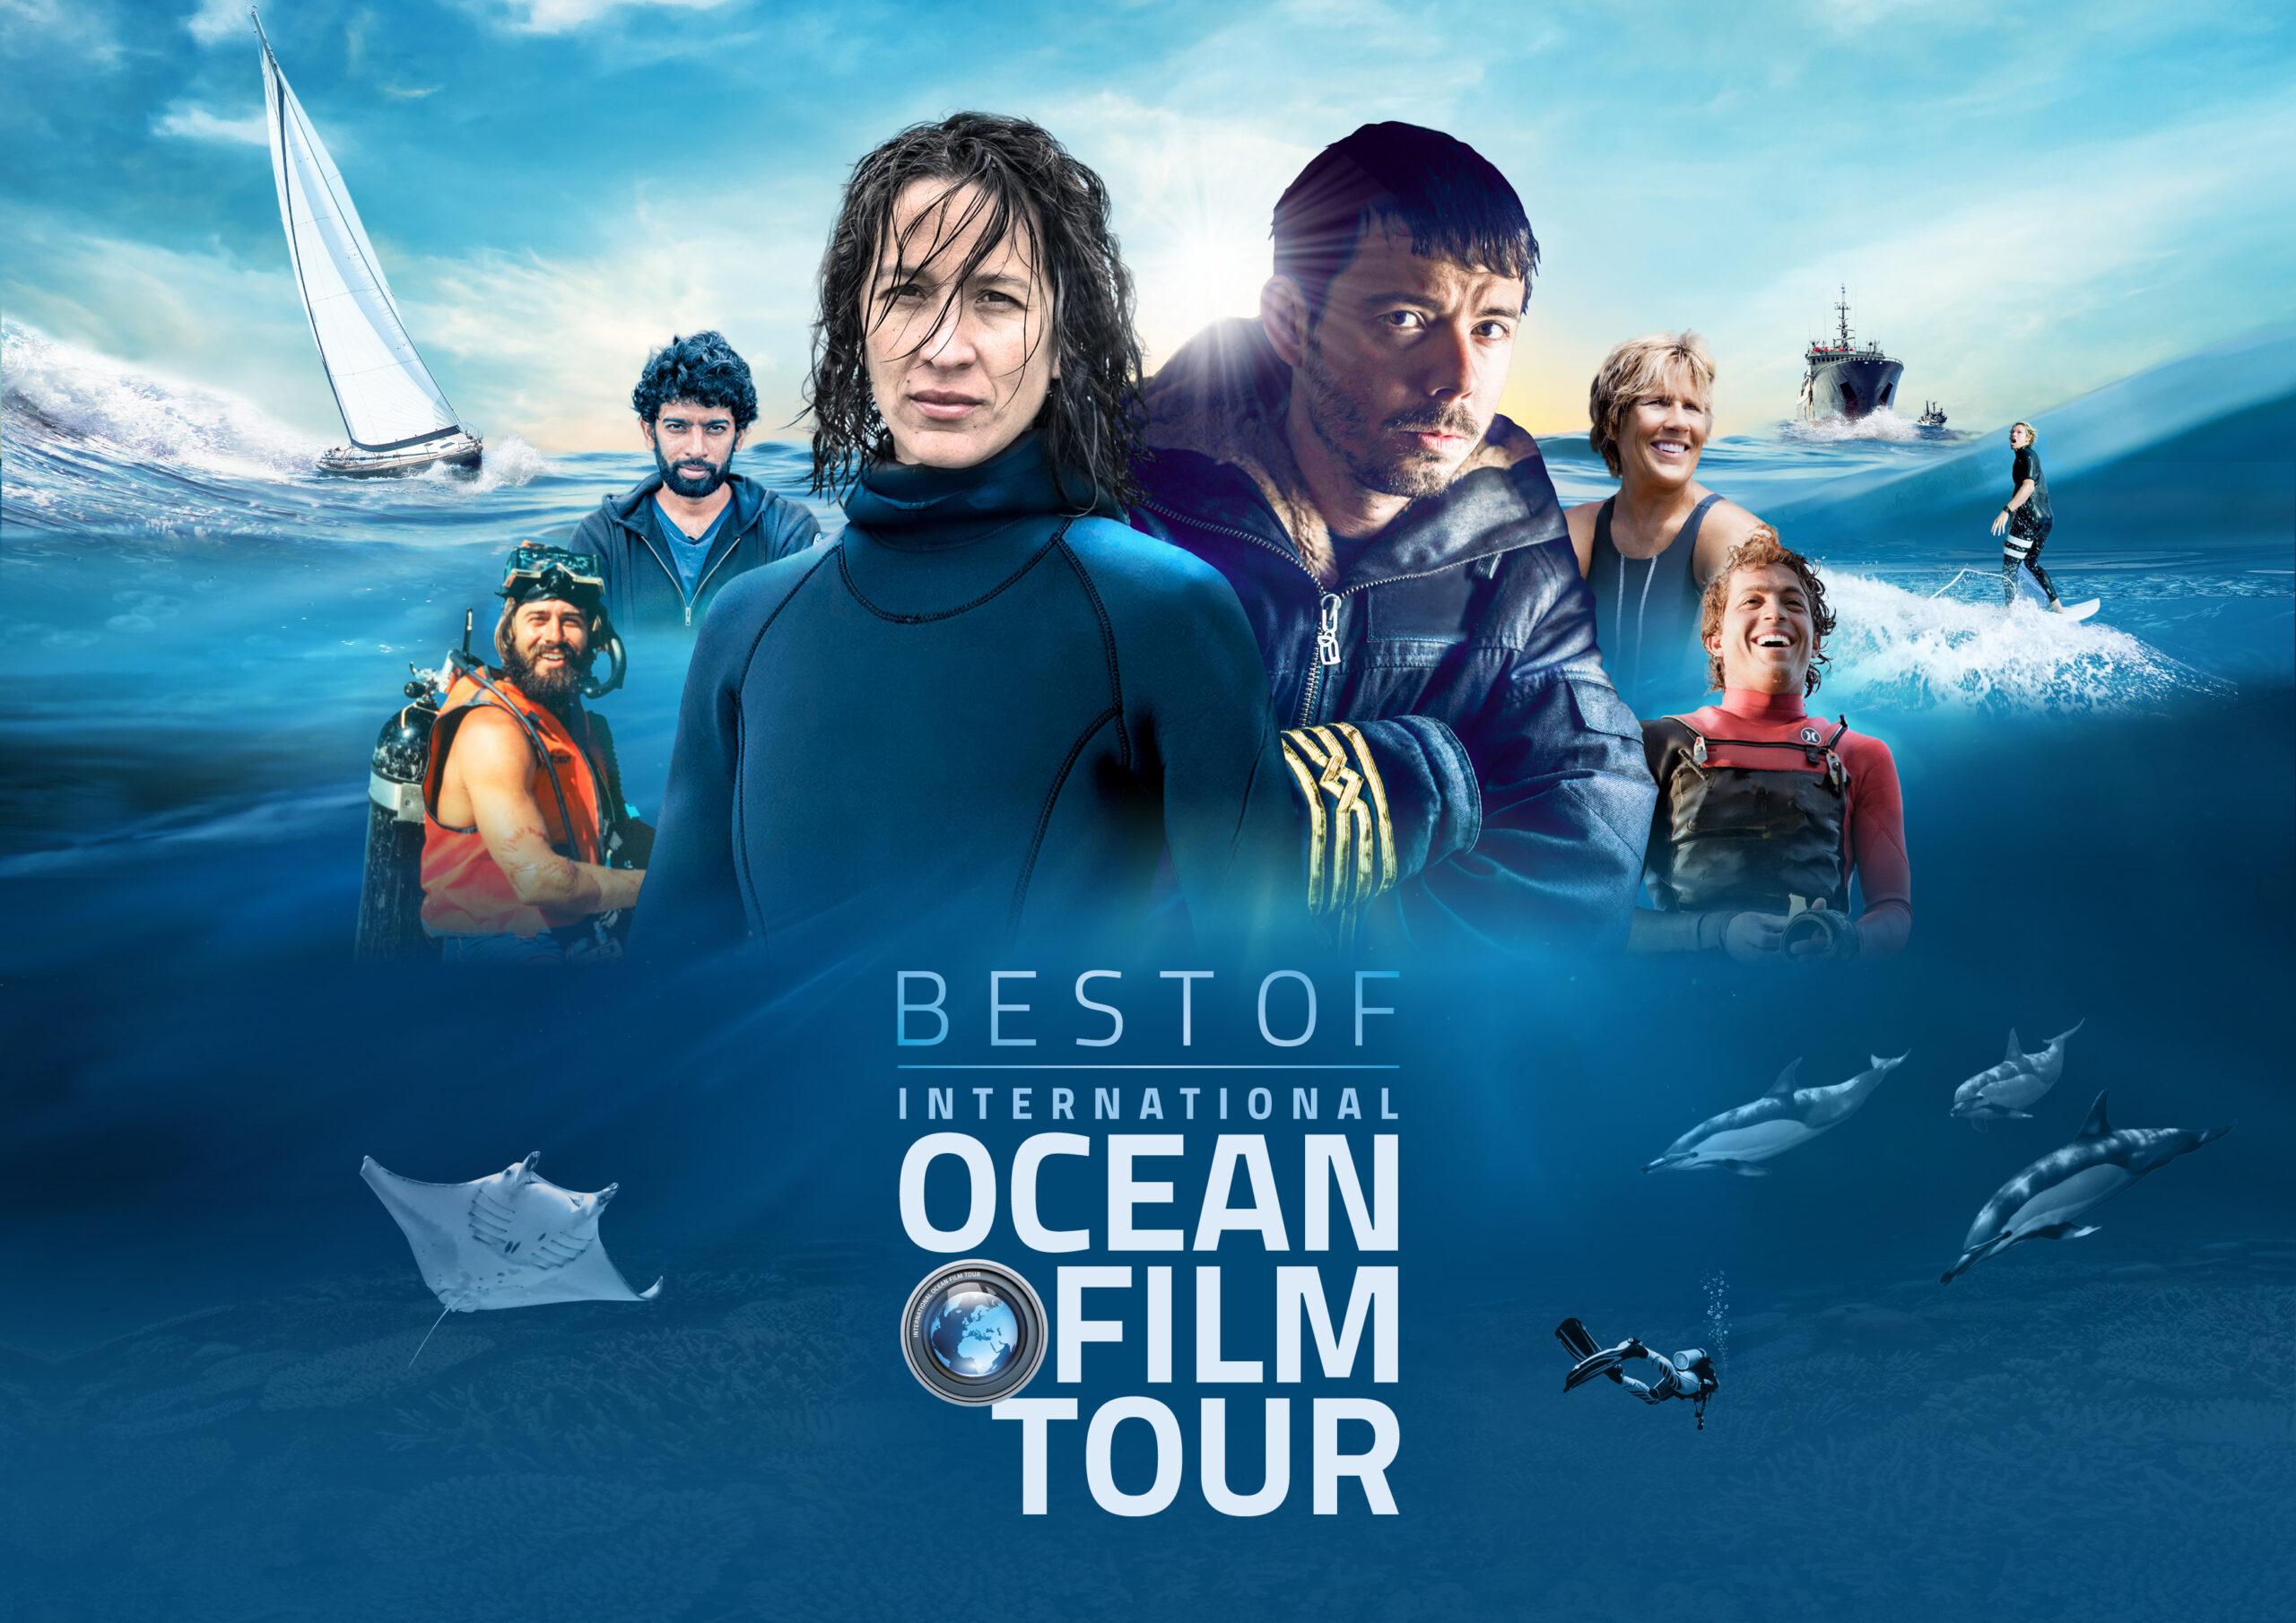 https://www.ccsaar.de/wp-content/uploads/2021/10/OCEAN_Best_Of_KeyVisual-scaled.jpg